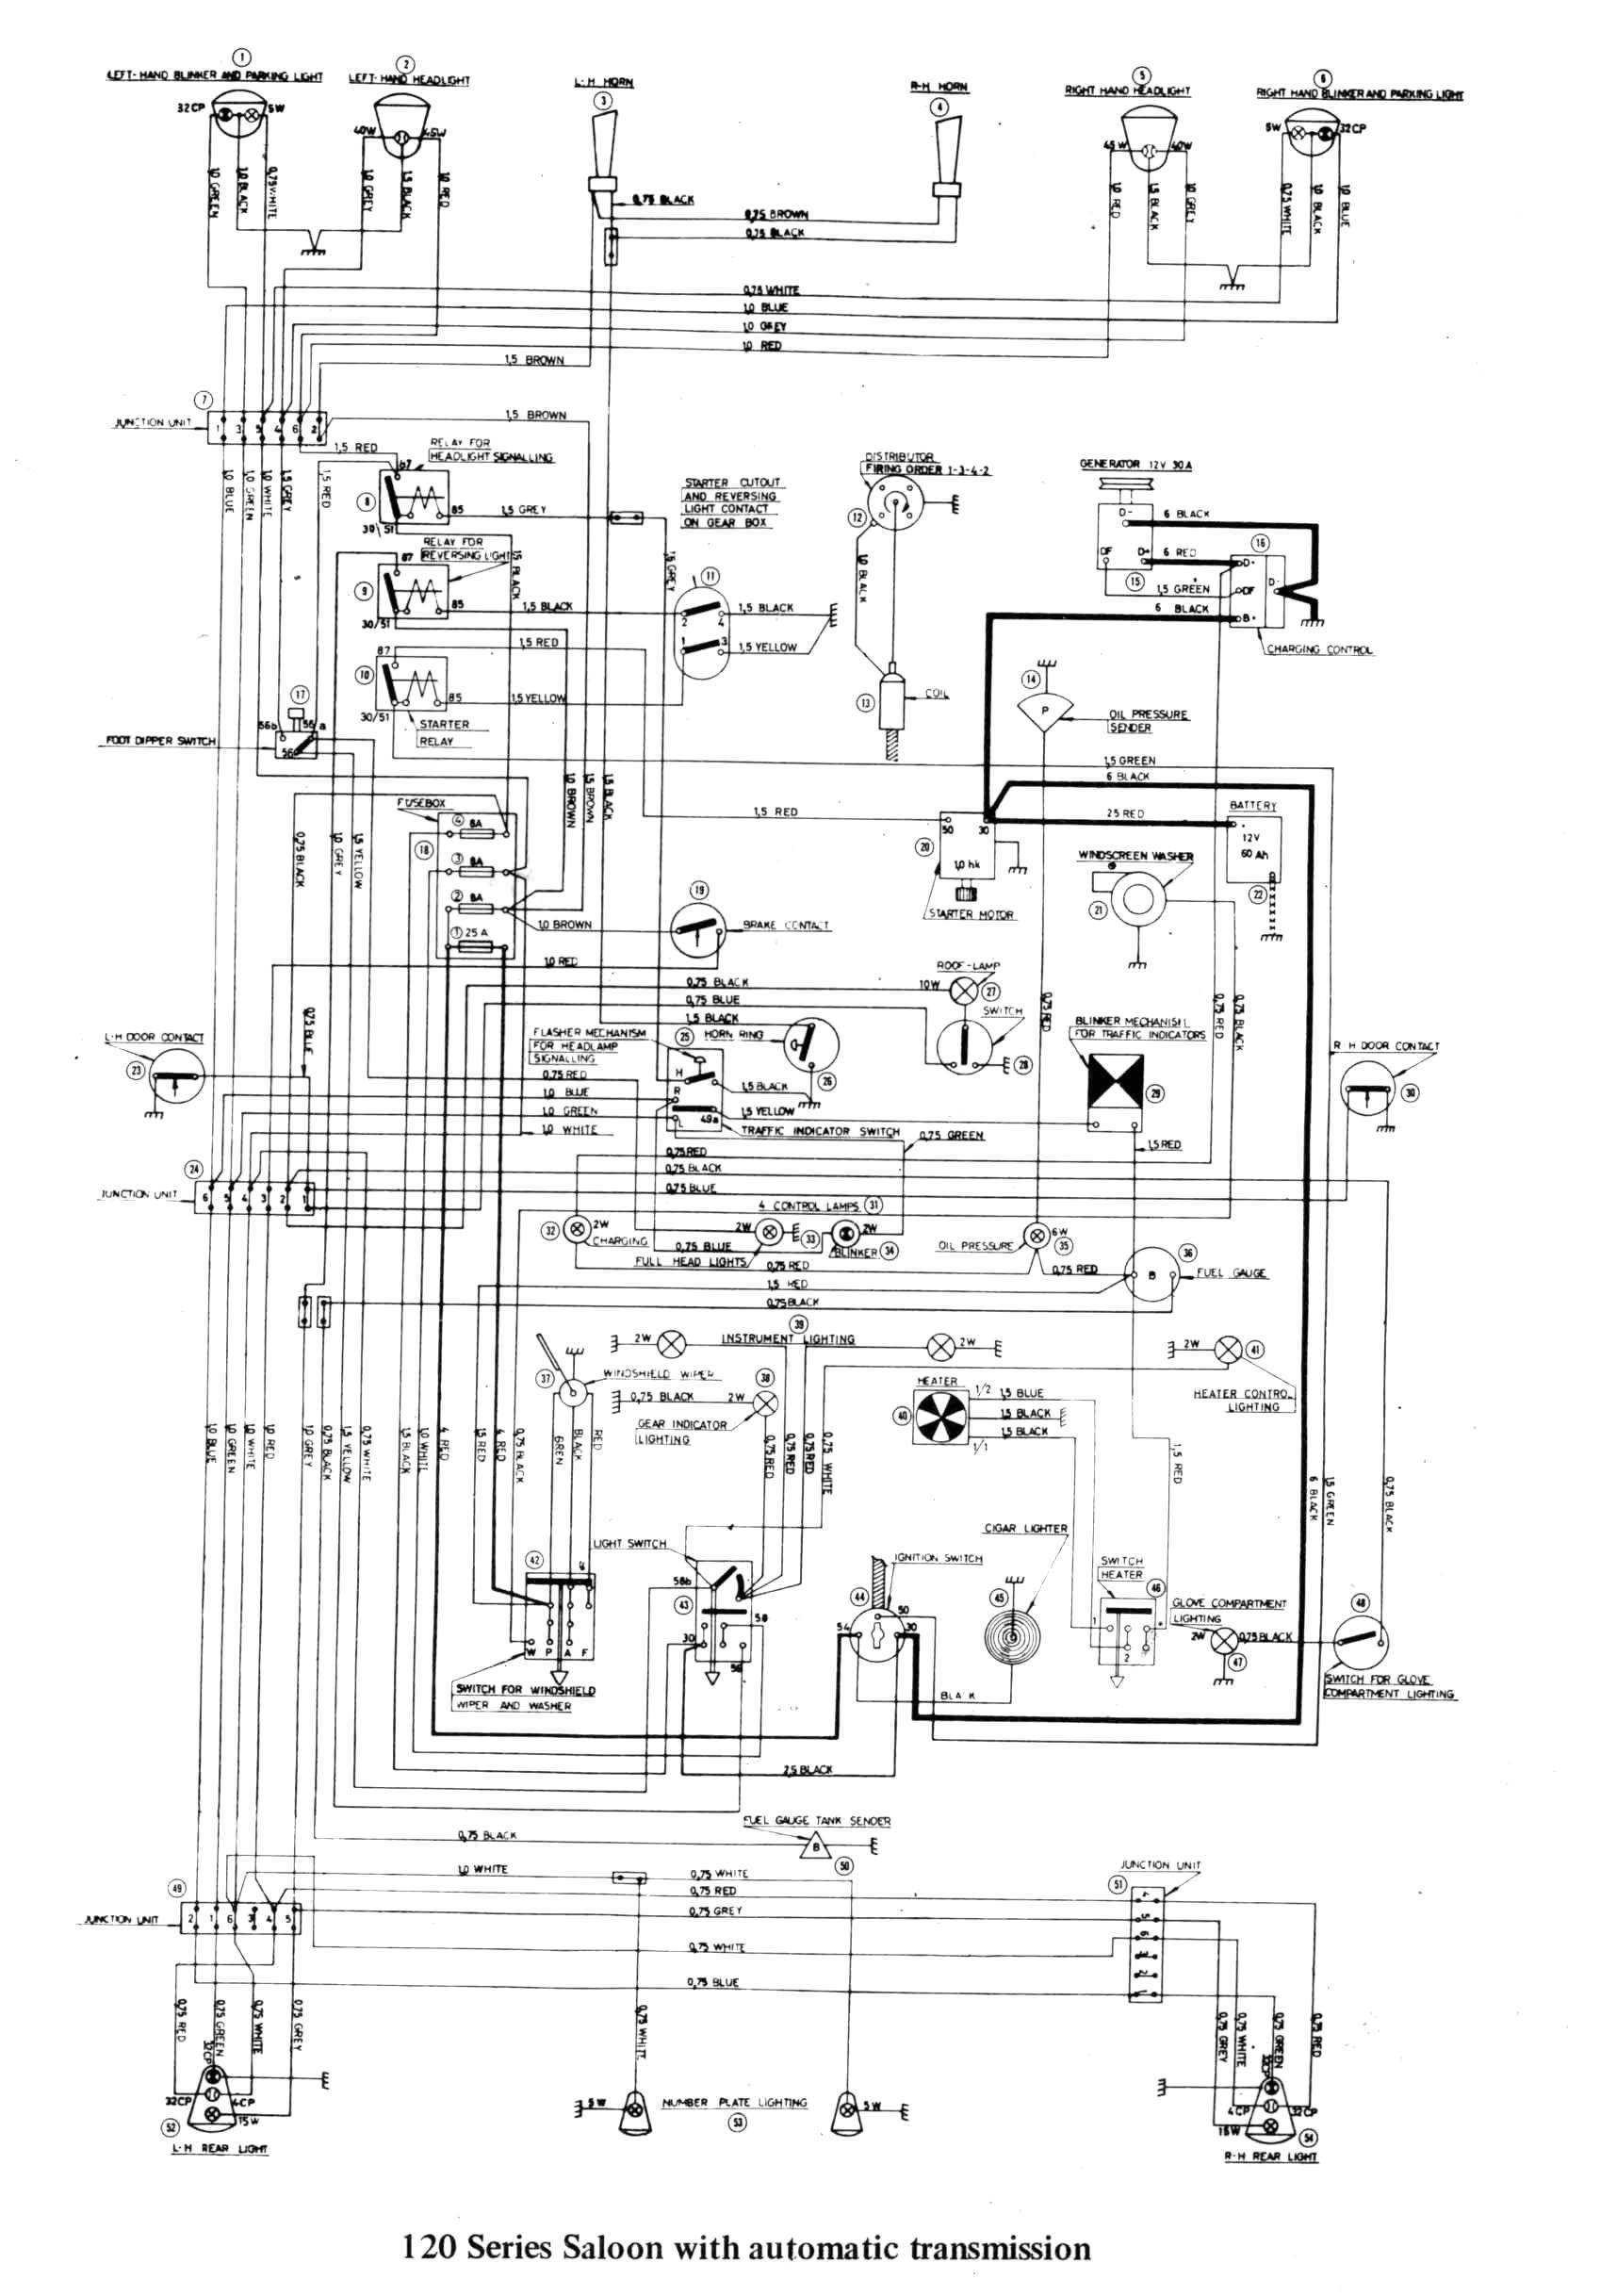 fleetwood rv schematics wiring diagram 1995 fleetwood southwind rv wiring diagram